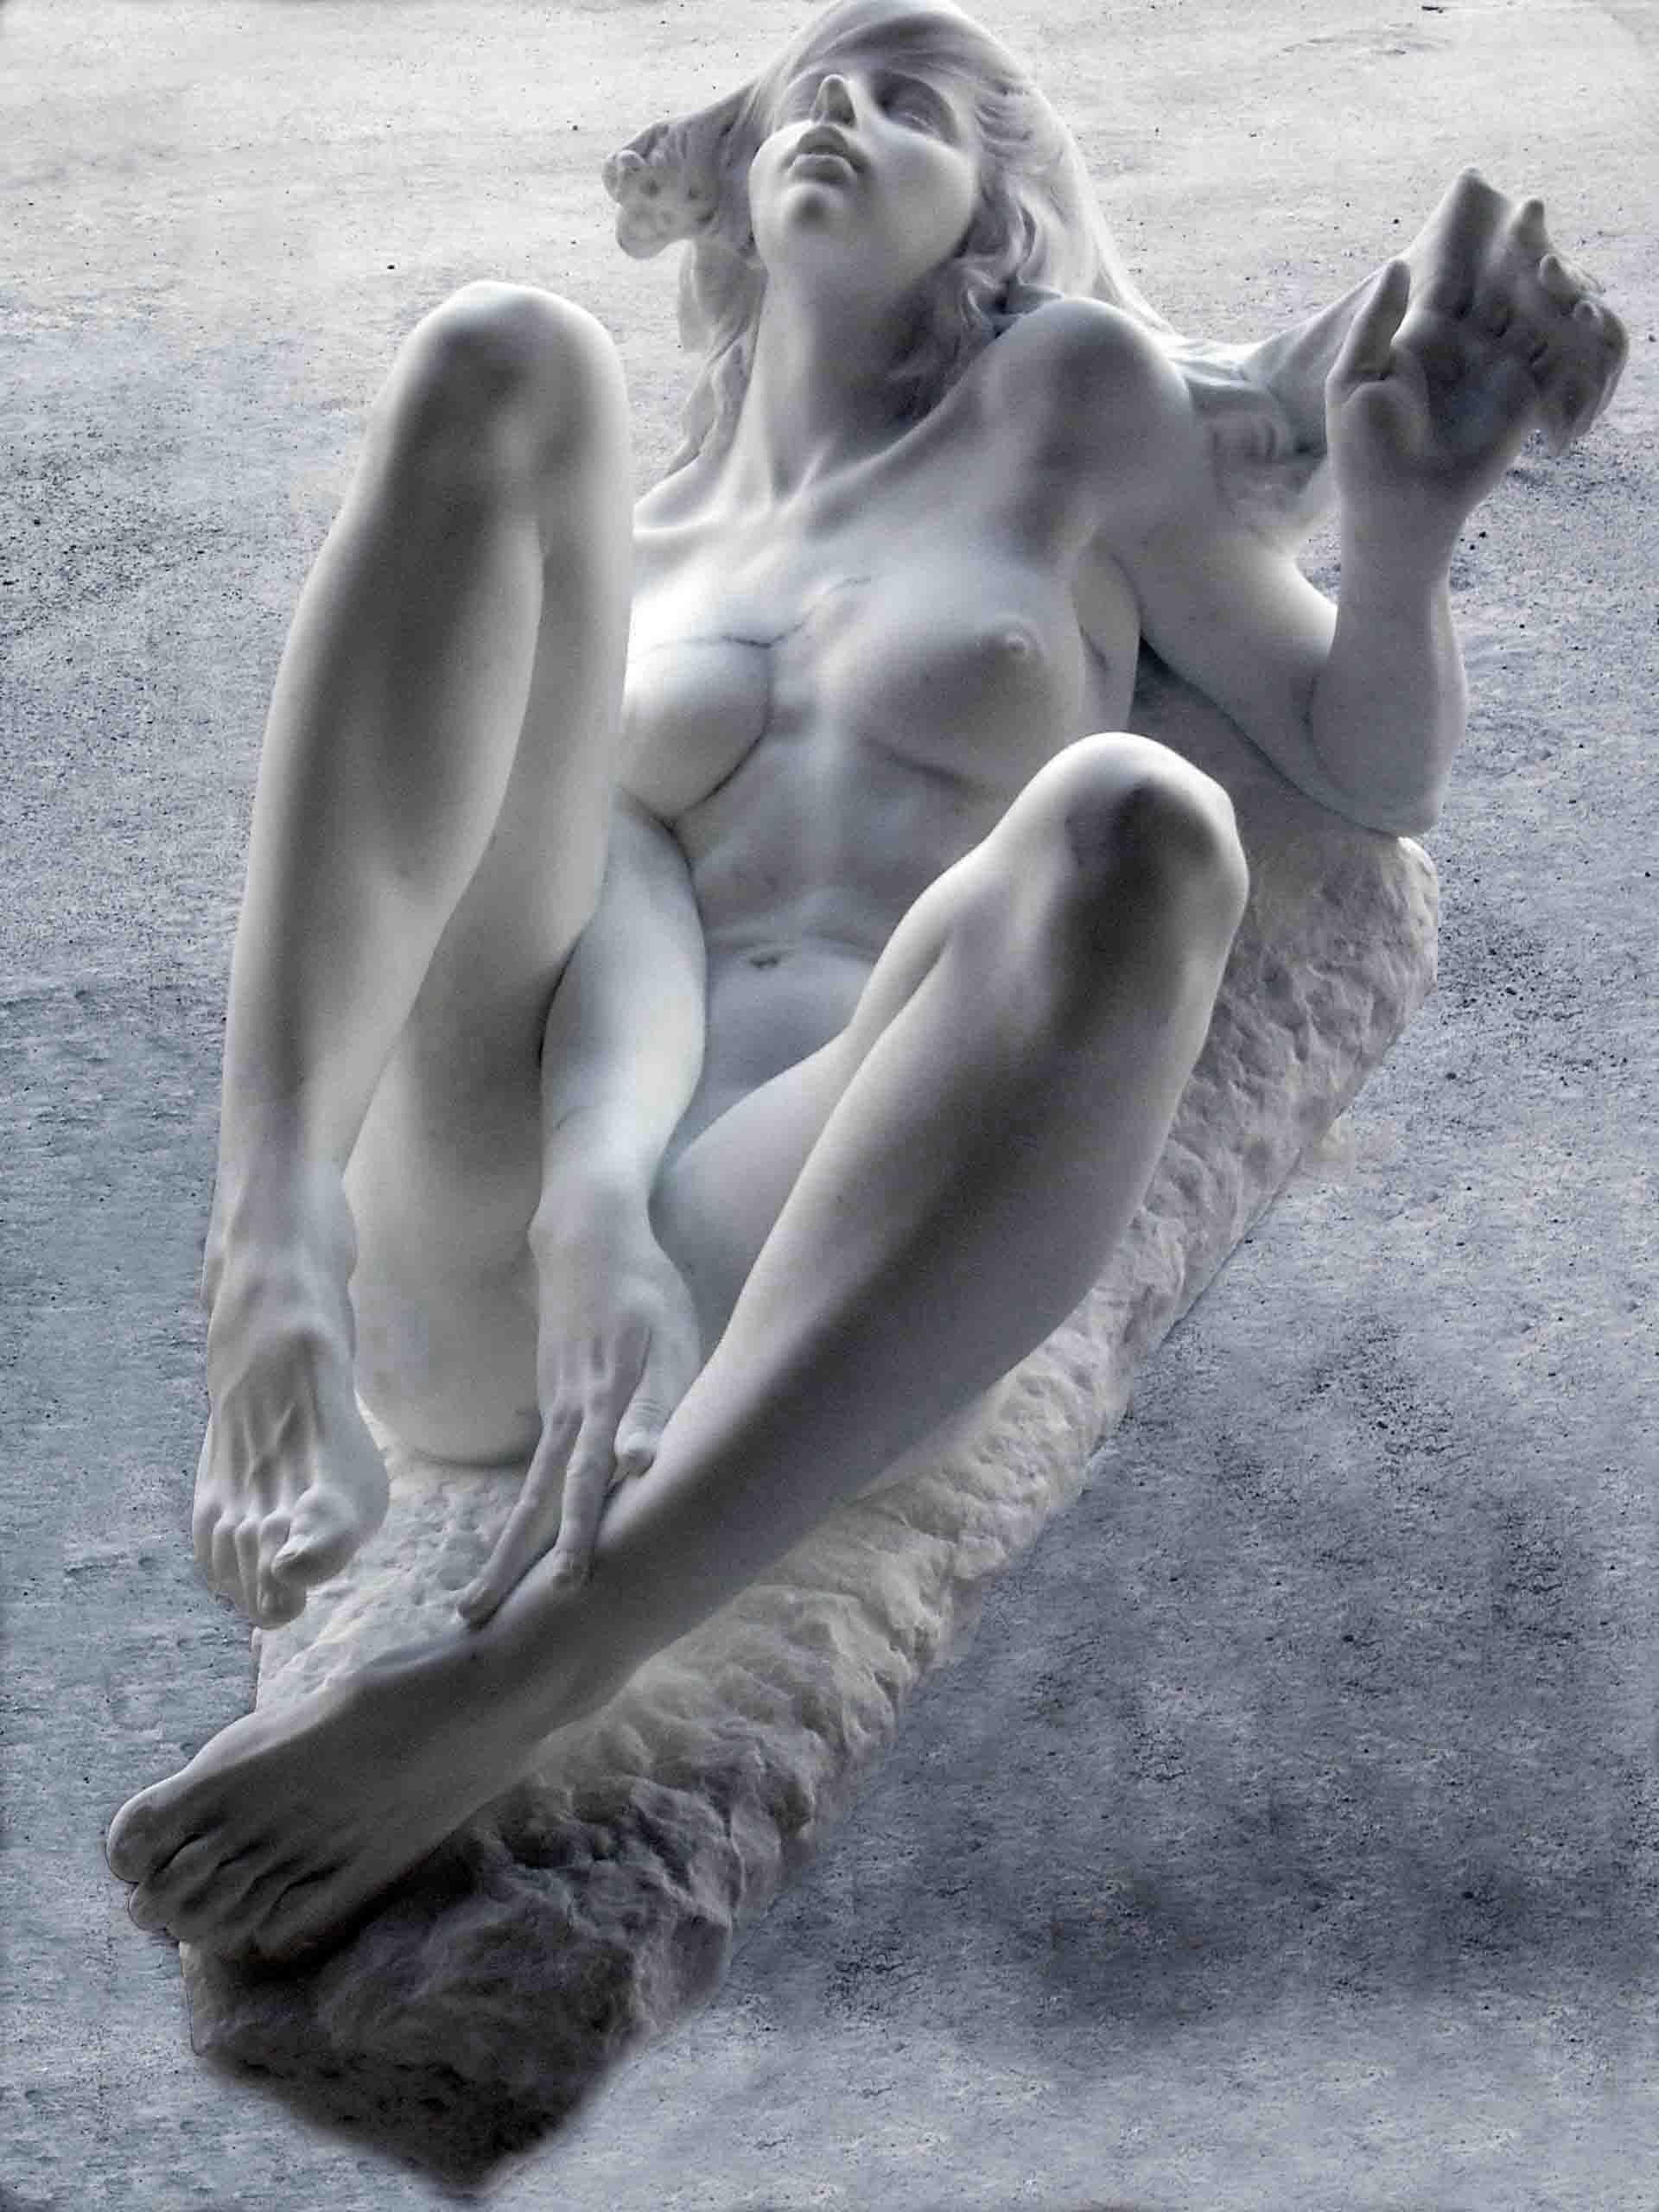 Naked mature women groups